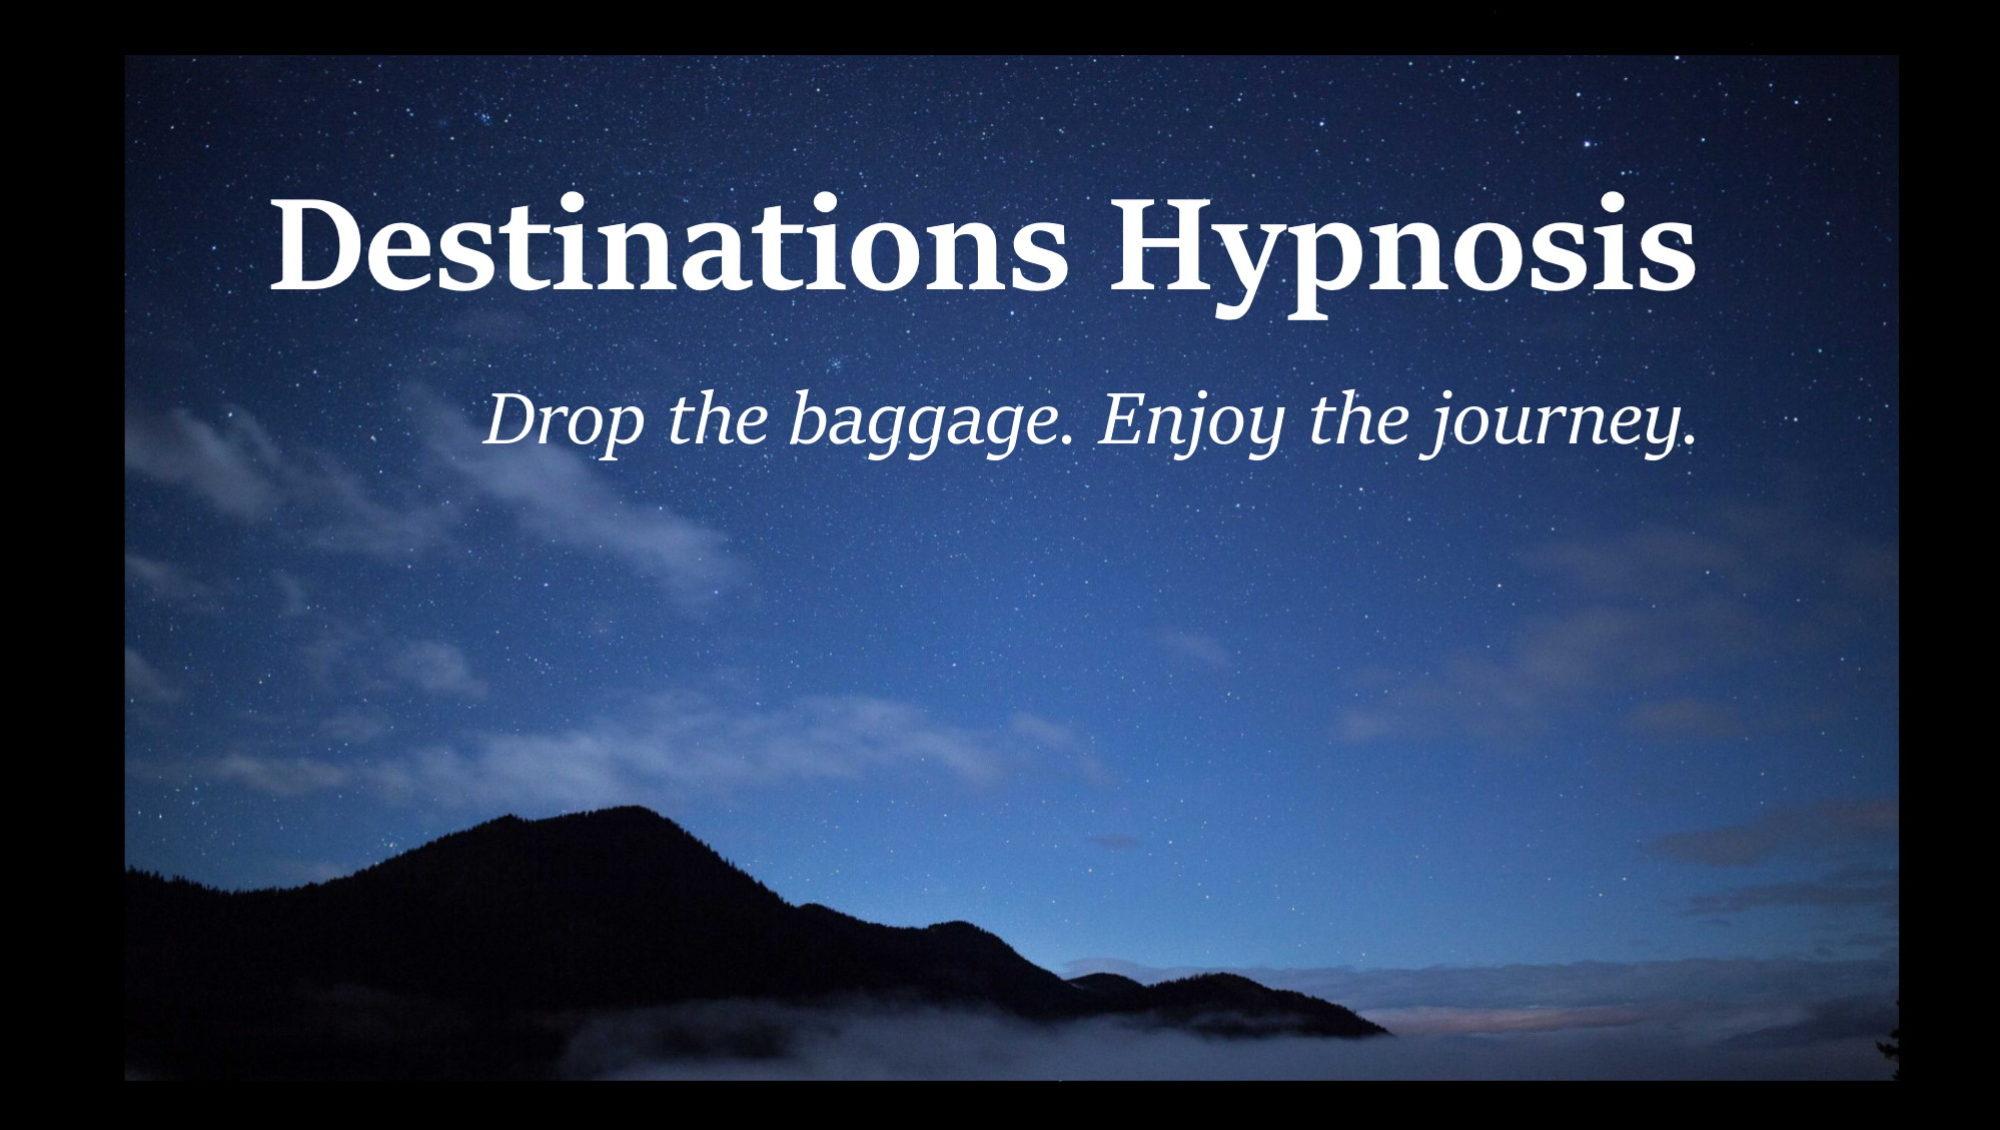 Destinations Hypnosis